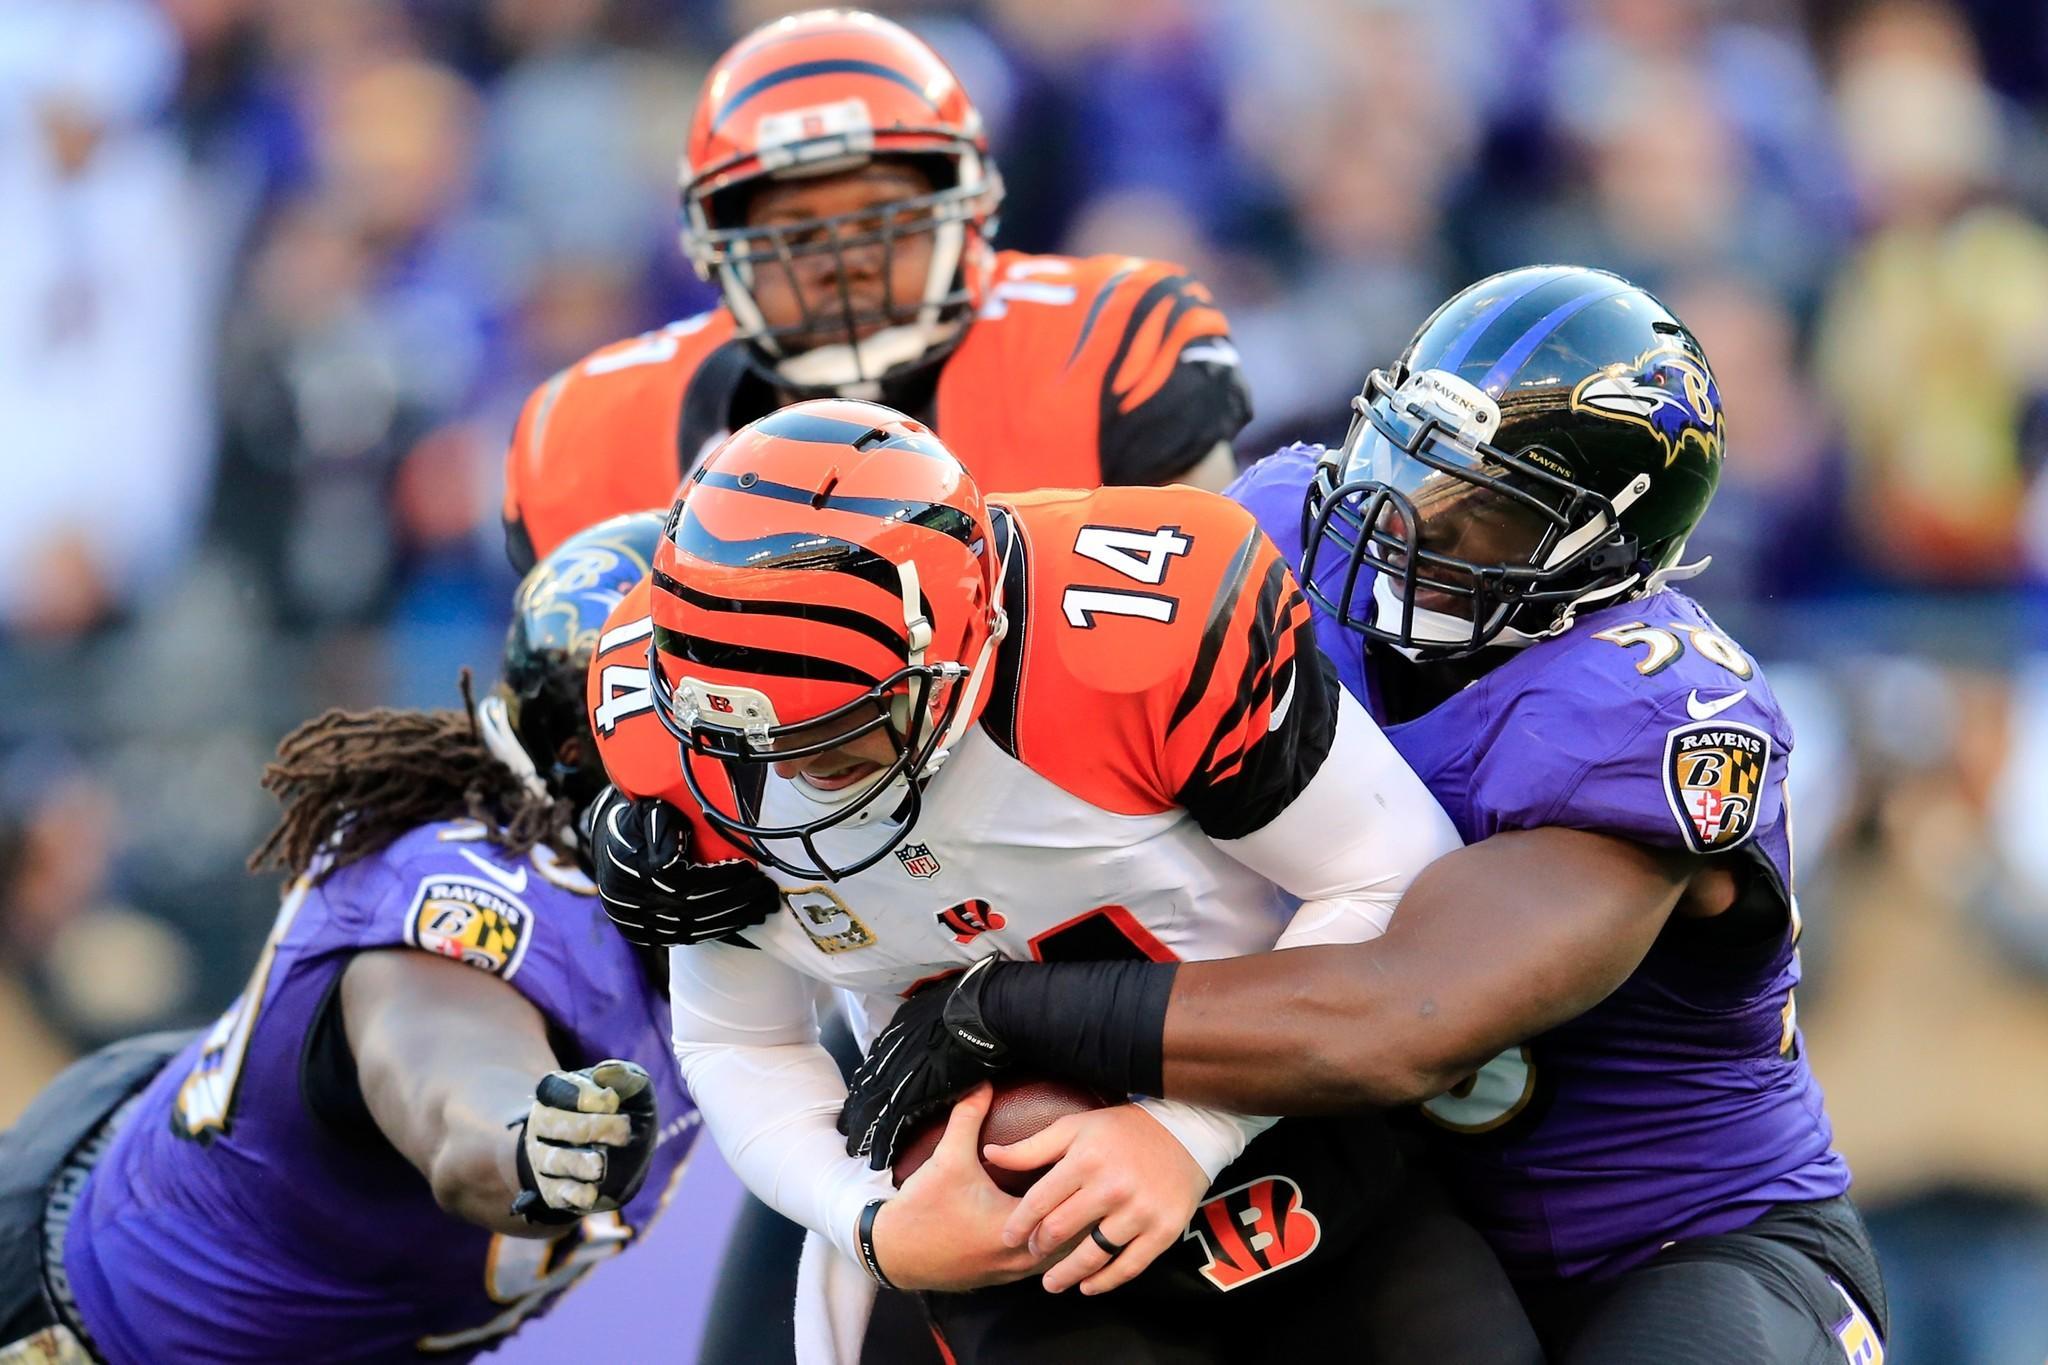 Ravens linebacker Elvis Dumervil sacks Bengals quarterback Andy Dalton in the first meeting between the teams in November.